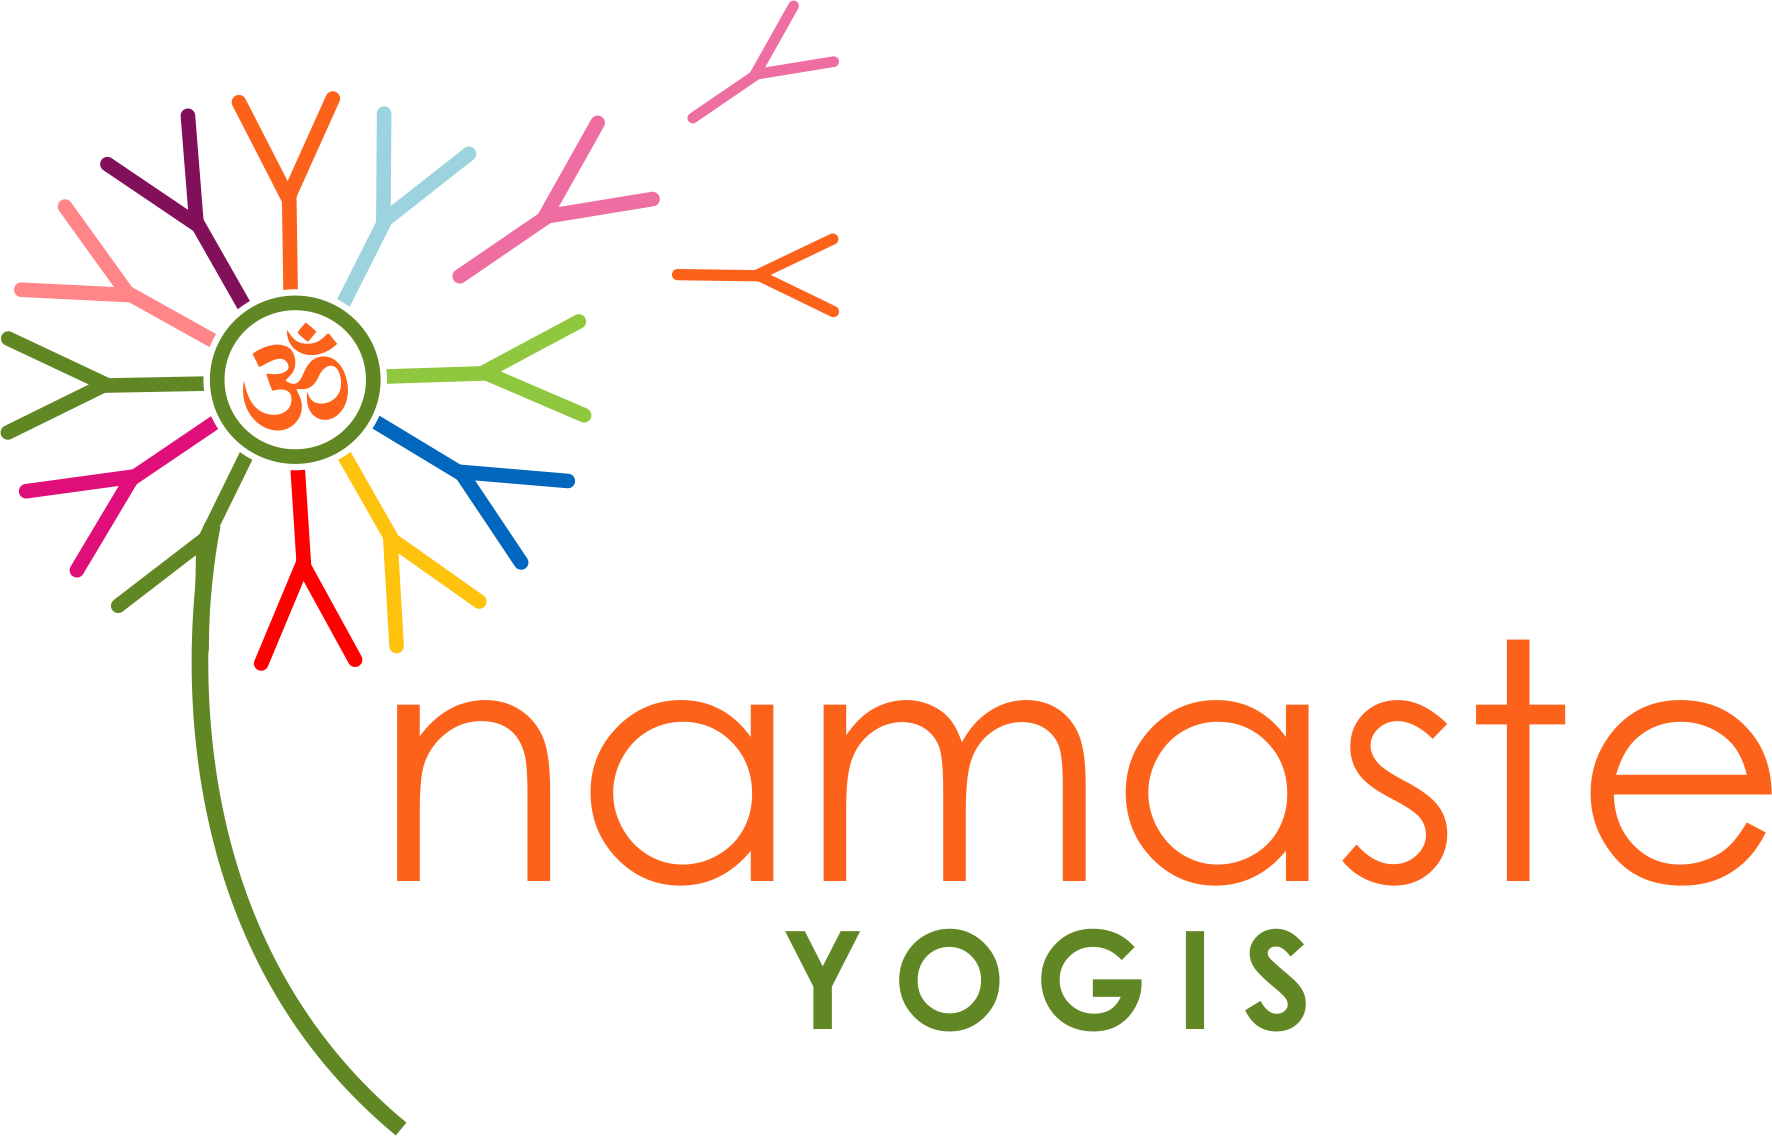 Namaste Yogis